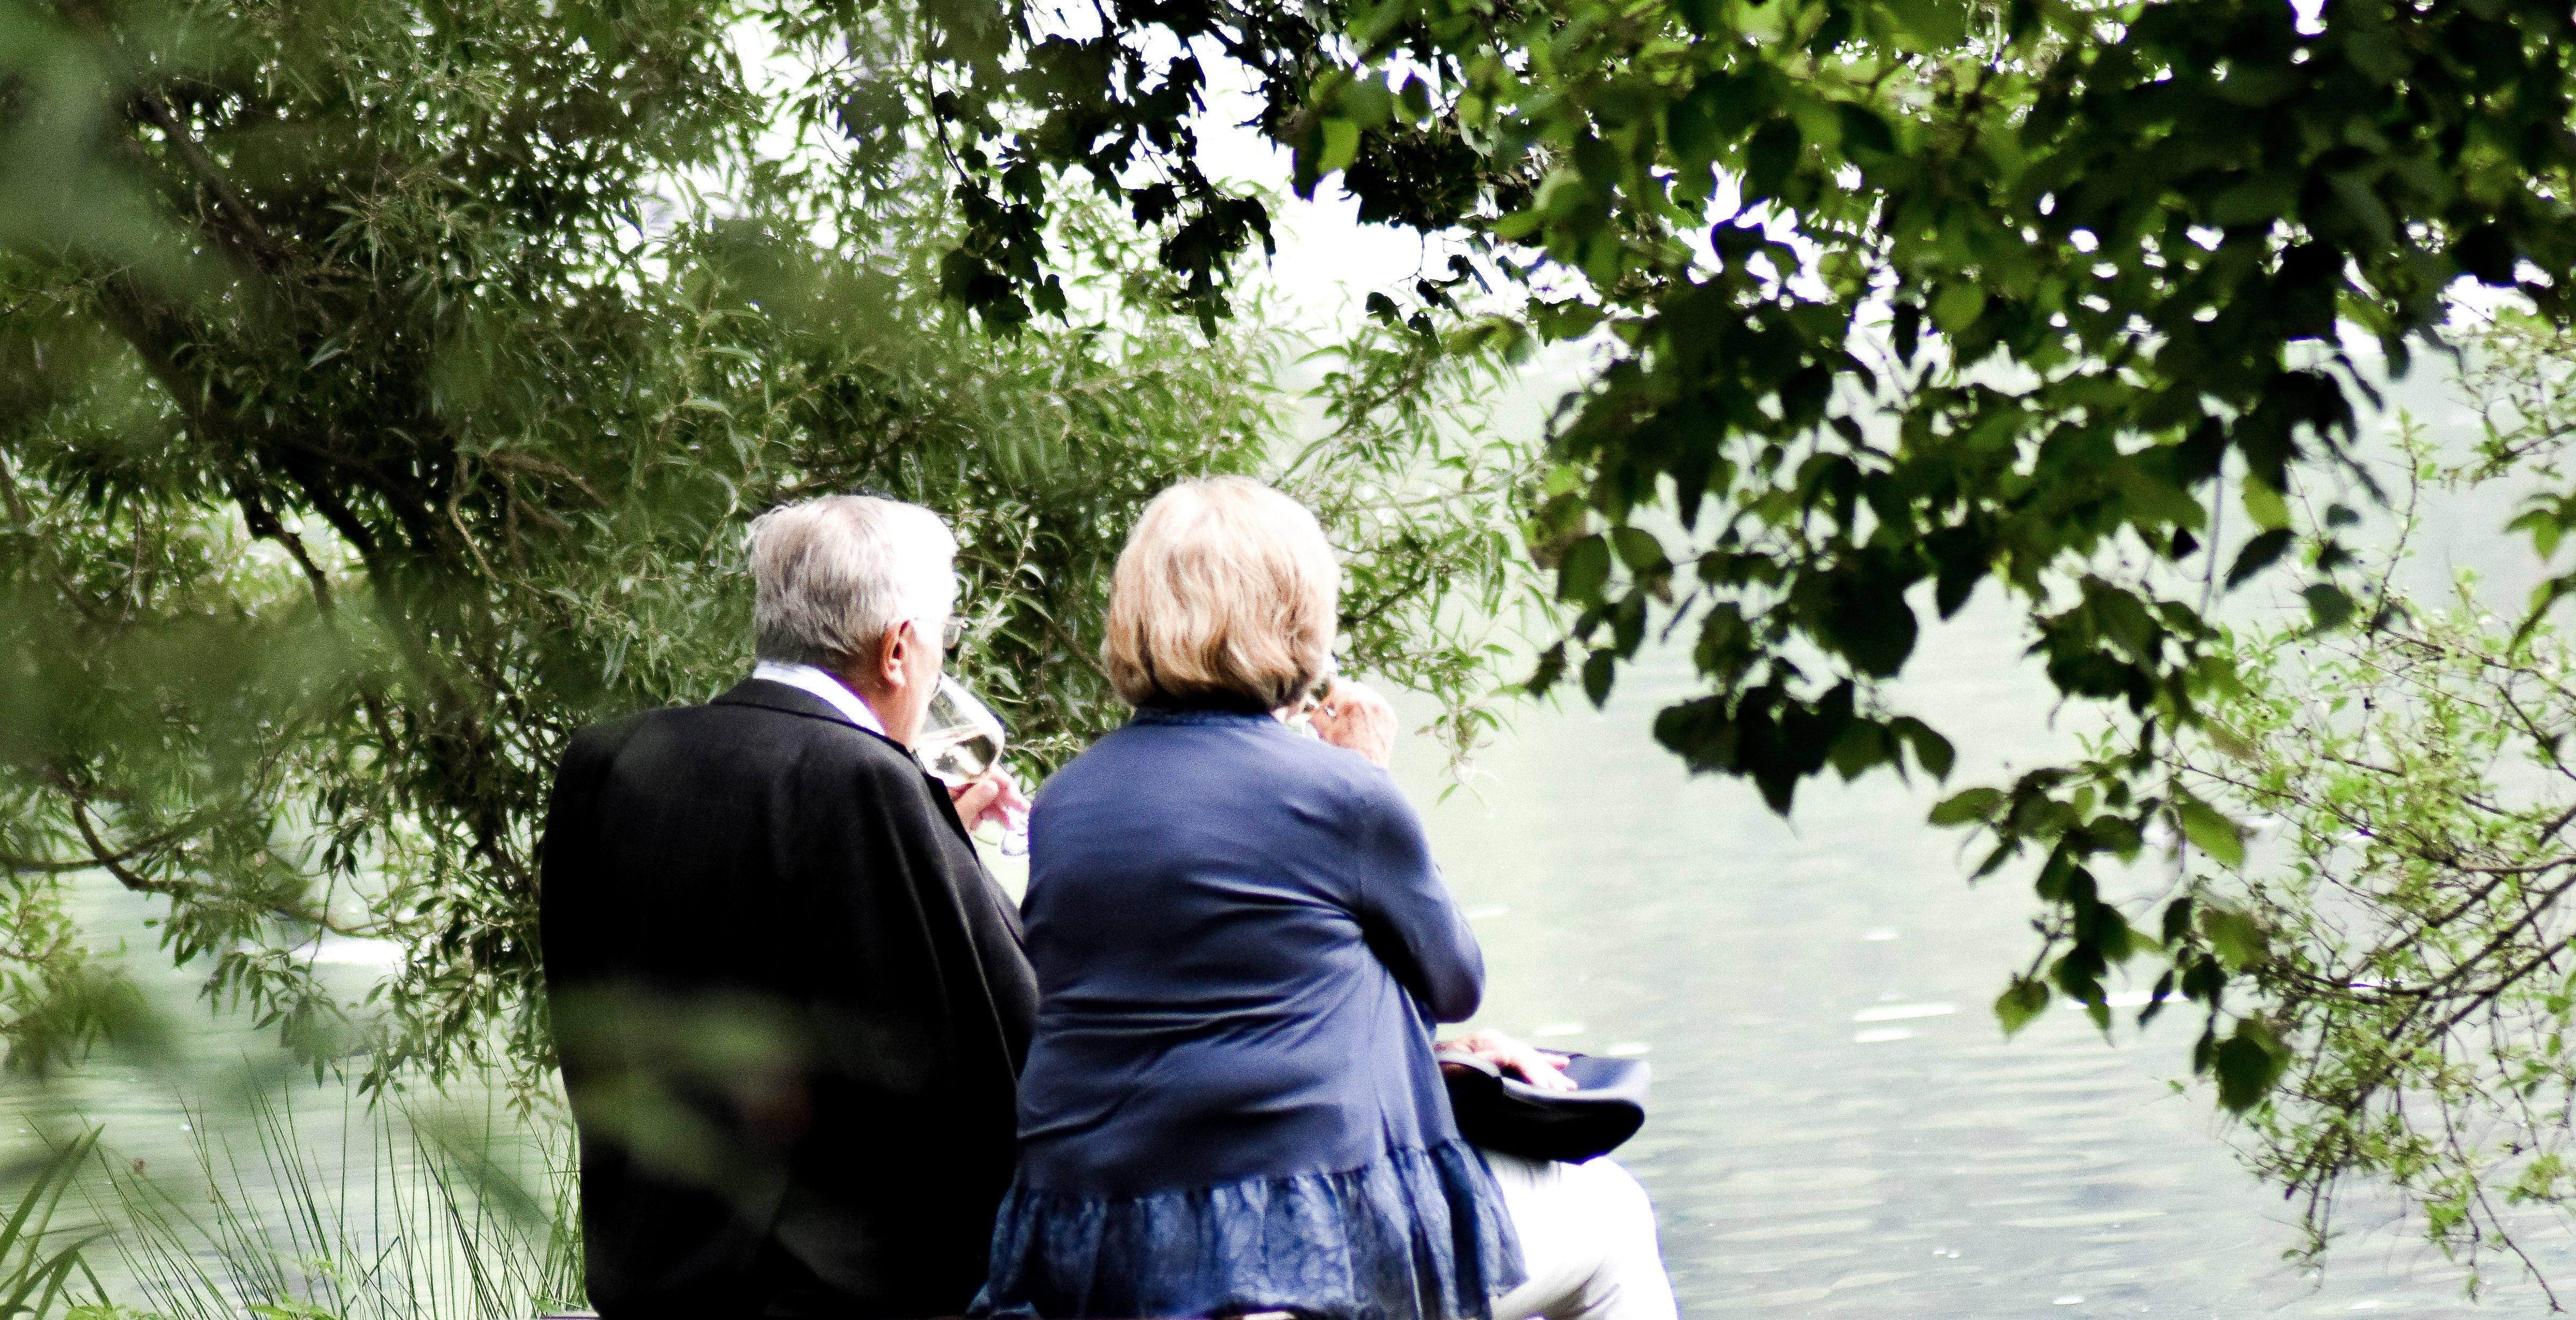 Happy Caregiving for Elderly Parents 明るい「介護のビジョン」を描くには